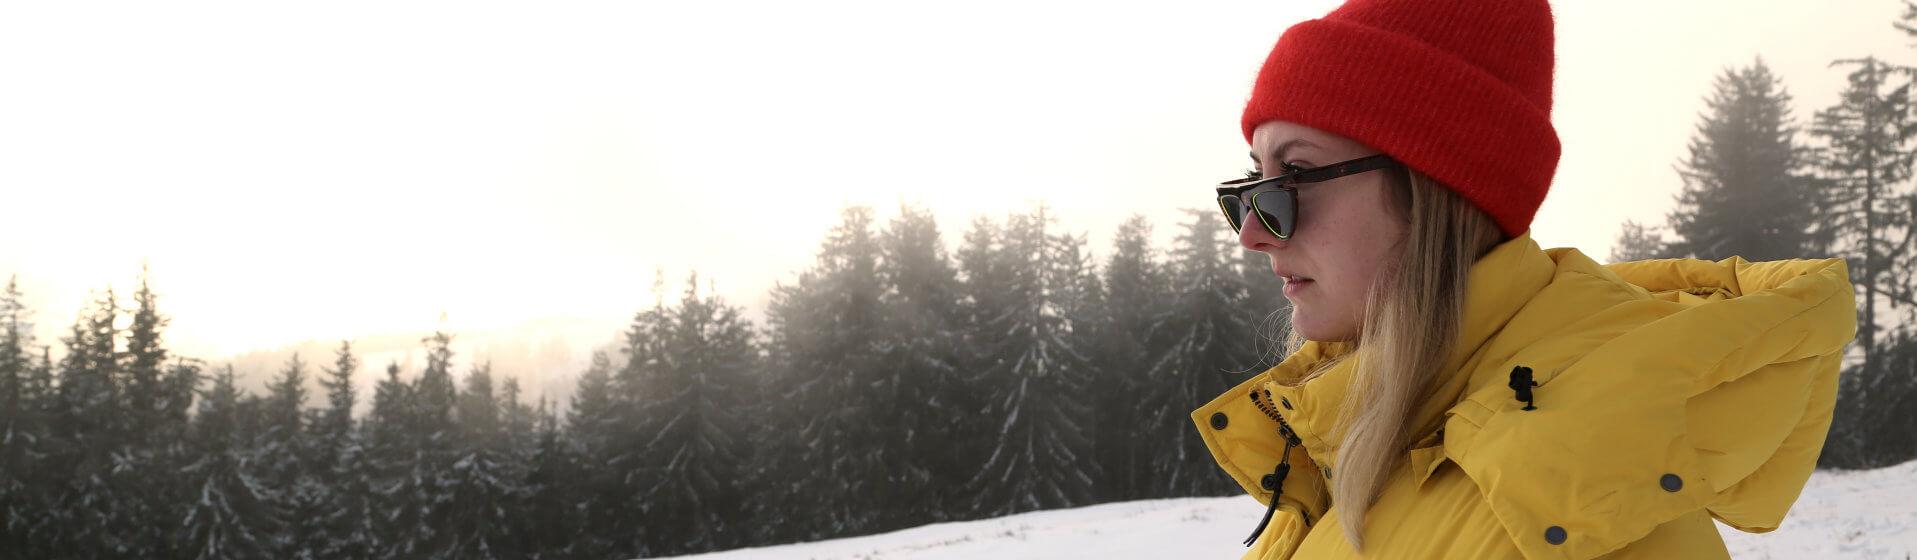 Apres-Ski Outfit Header